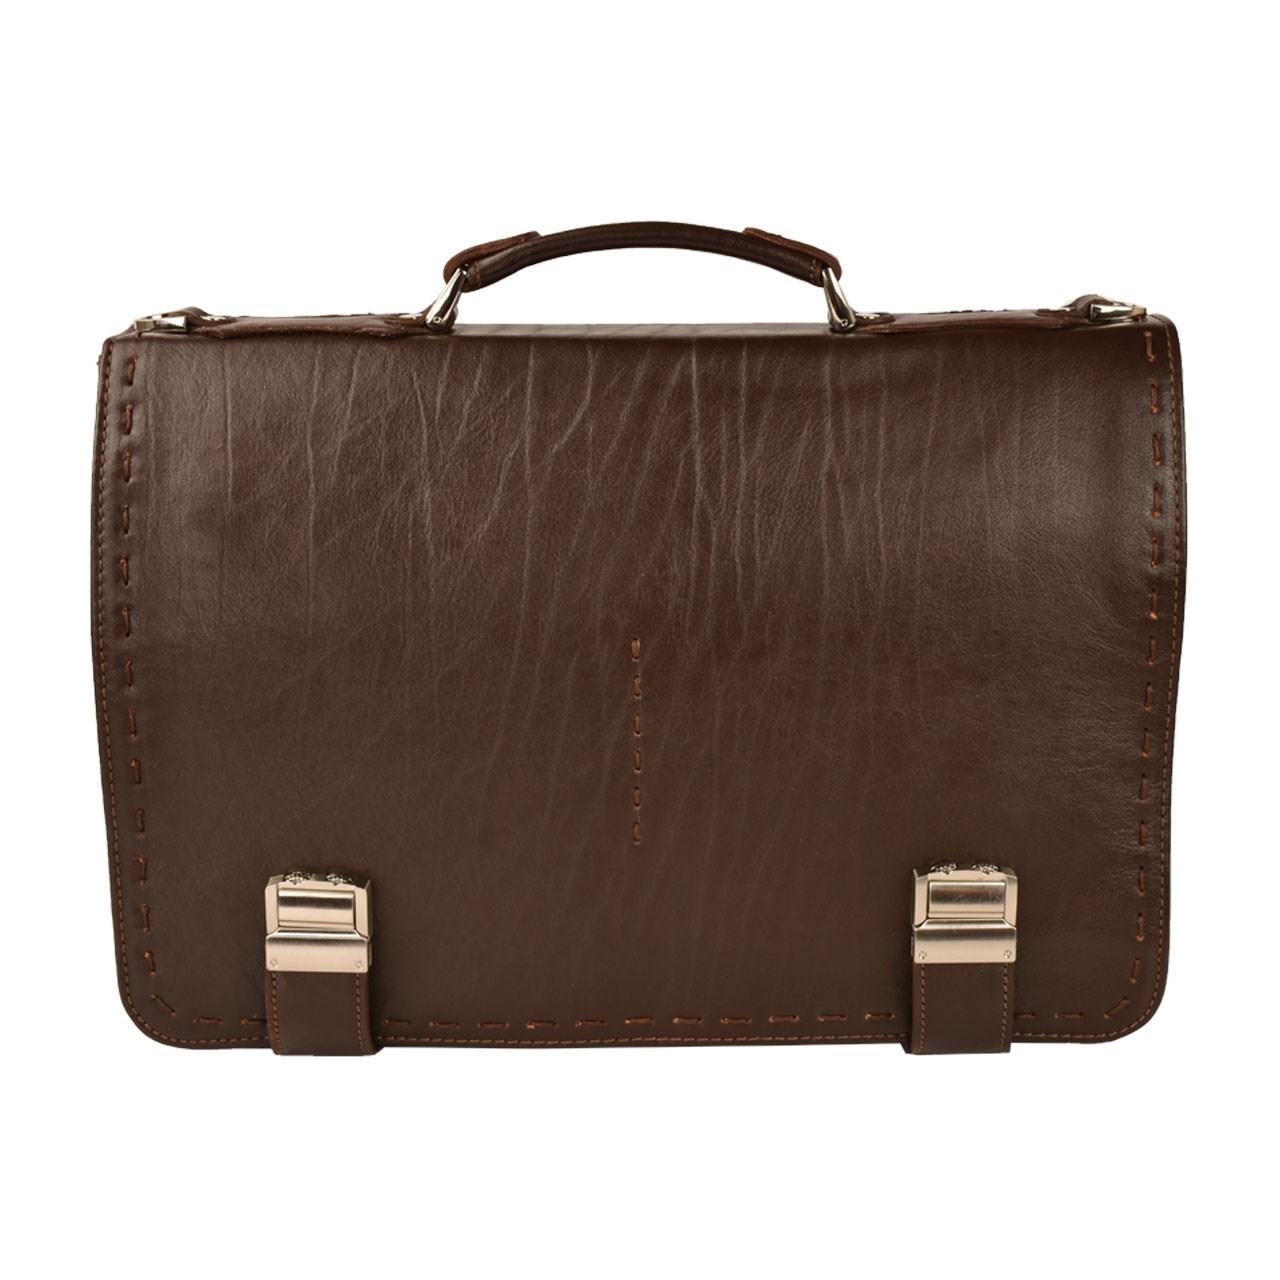 کیف اداری چرم طبیعی کهن چرم مدل L30-7